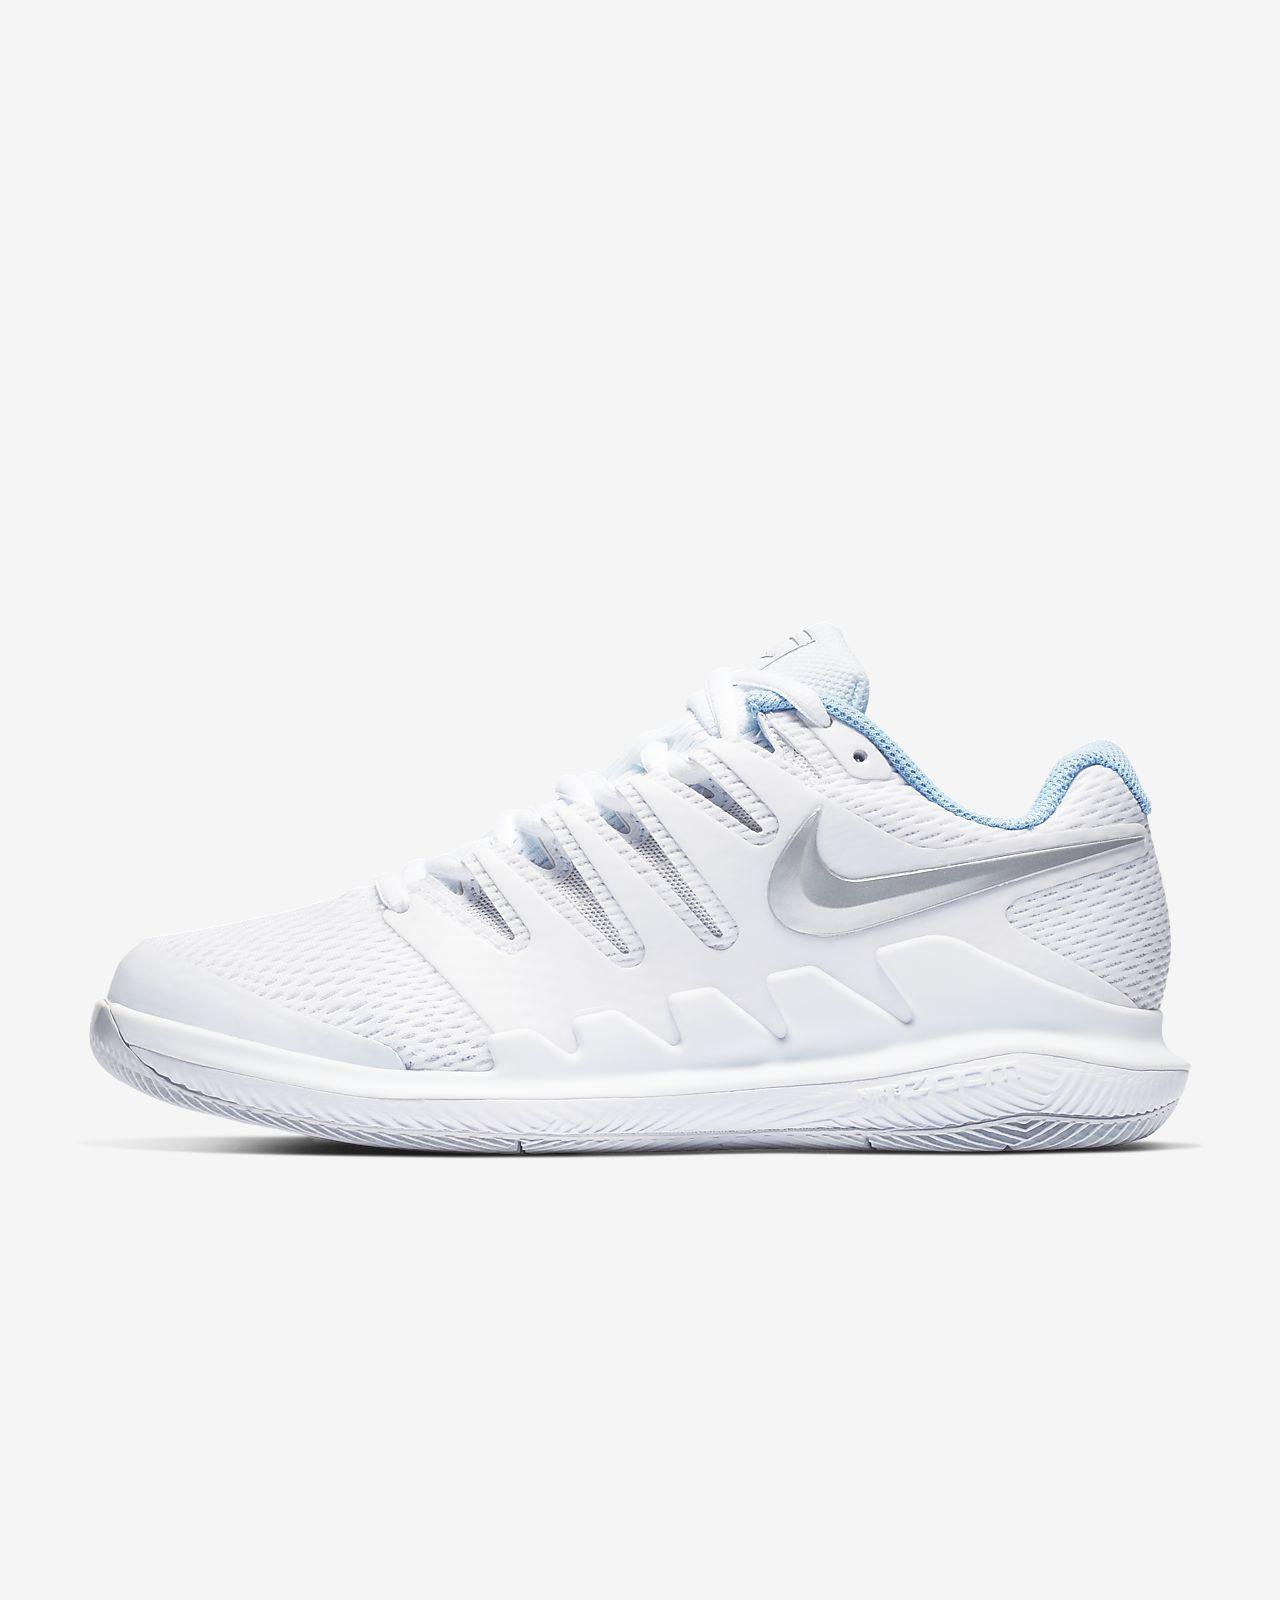 Nikecourt Air Zoom Vapor X Women S Hard Court Tennis Shoe Nike Com Tennis Shoes Stylish Shoes Air Zoom